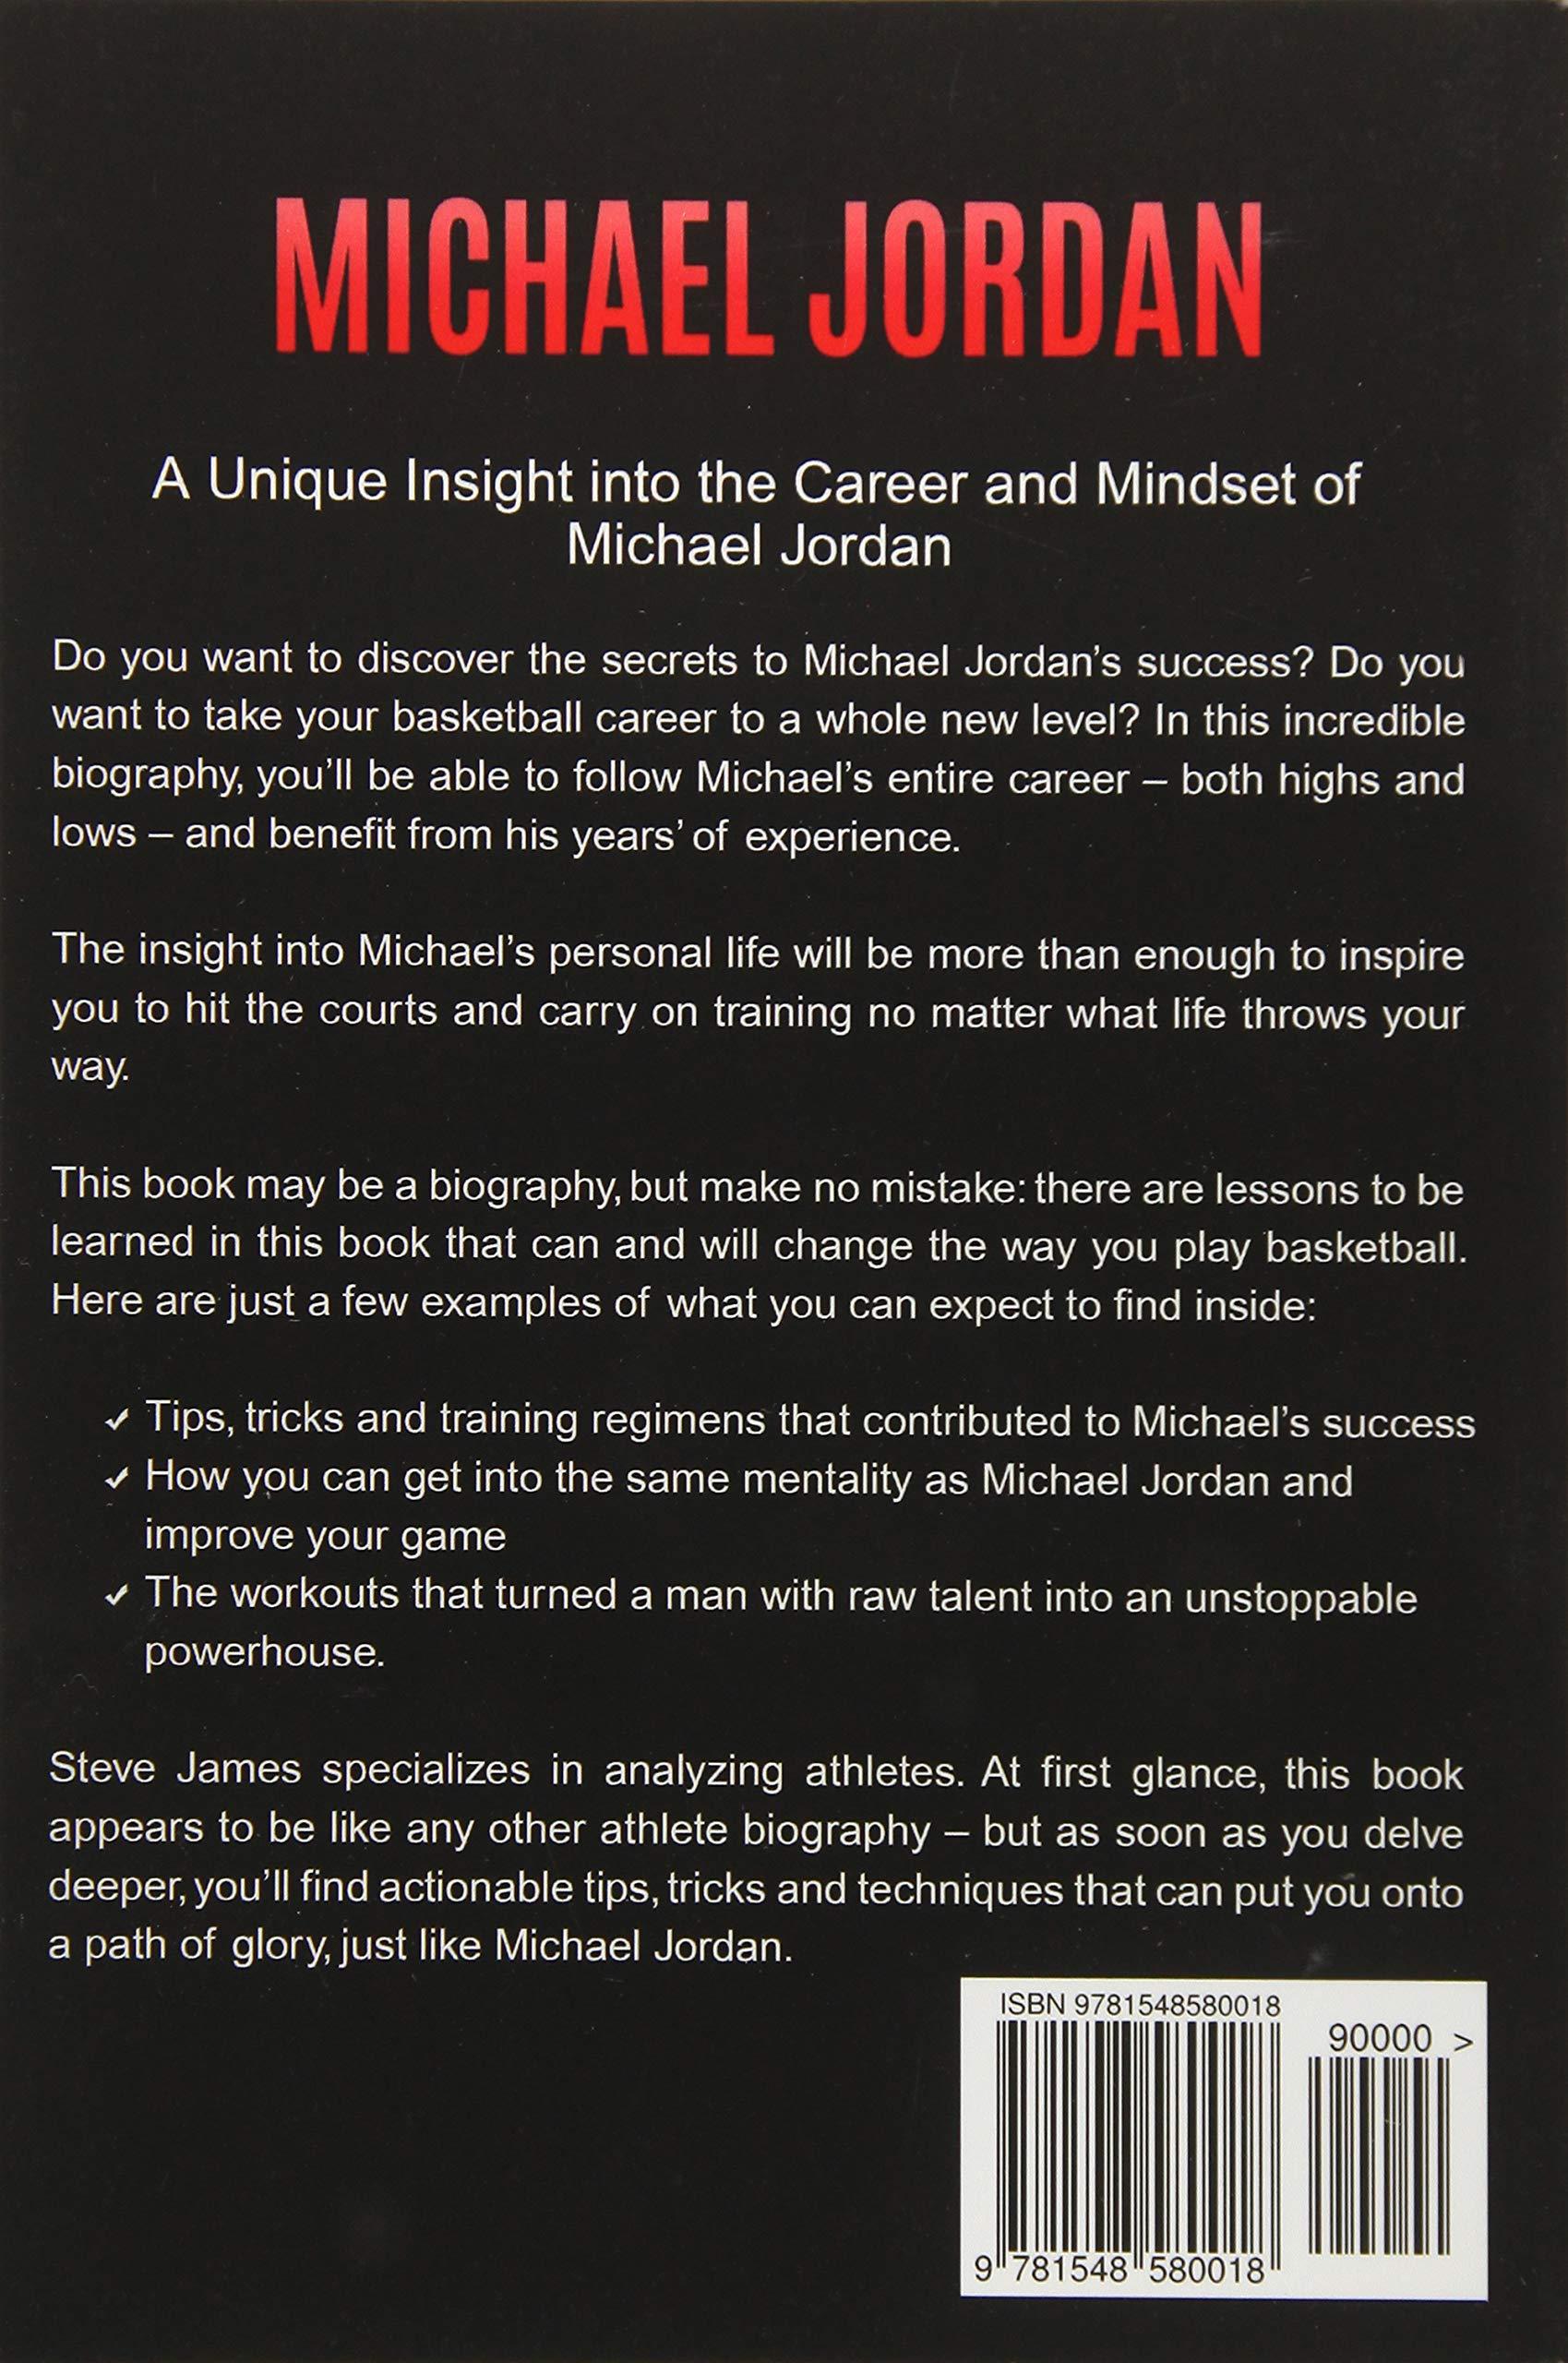 ca1b7924d8f Michael Jordan: A Unique Insight into the Career and Mindset of Michael  Jordan: Steve James: 9781548580018: Amazon.com: Books